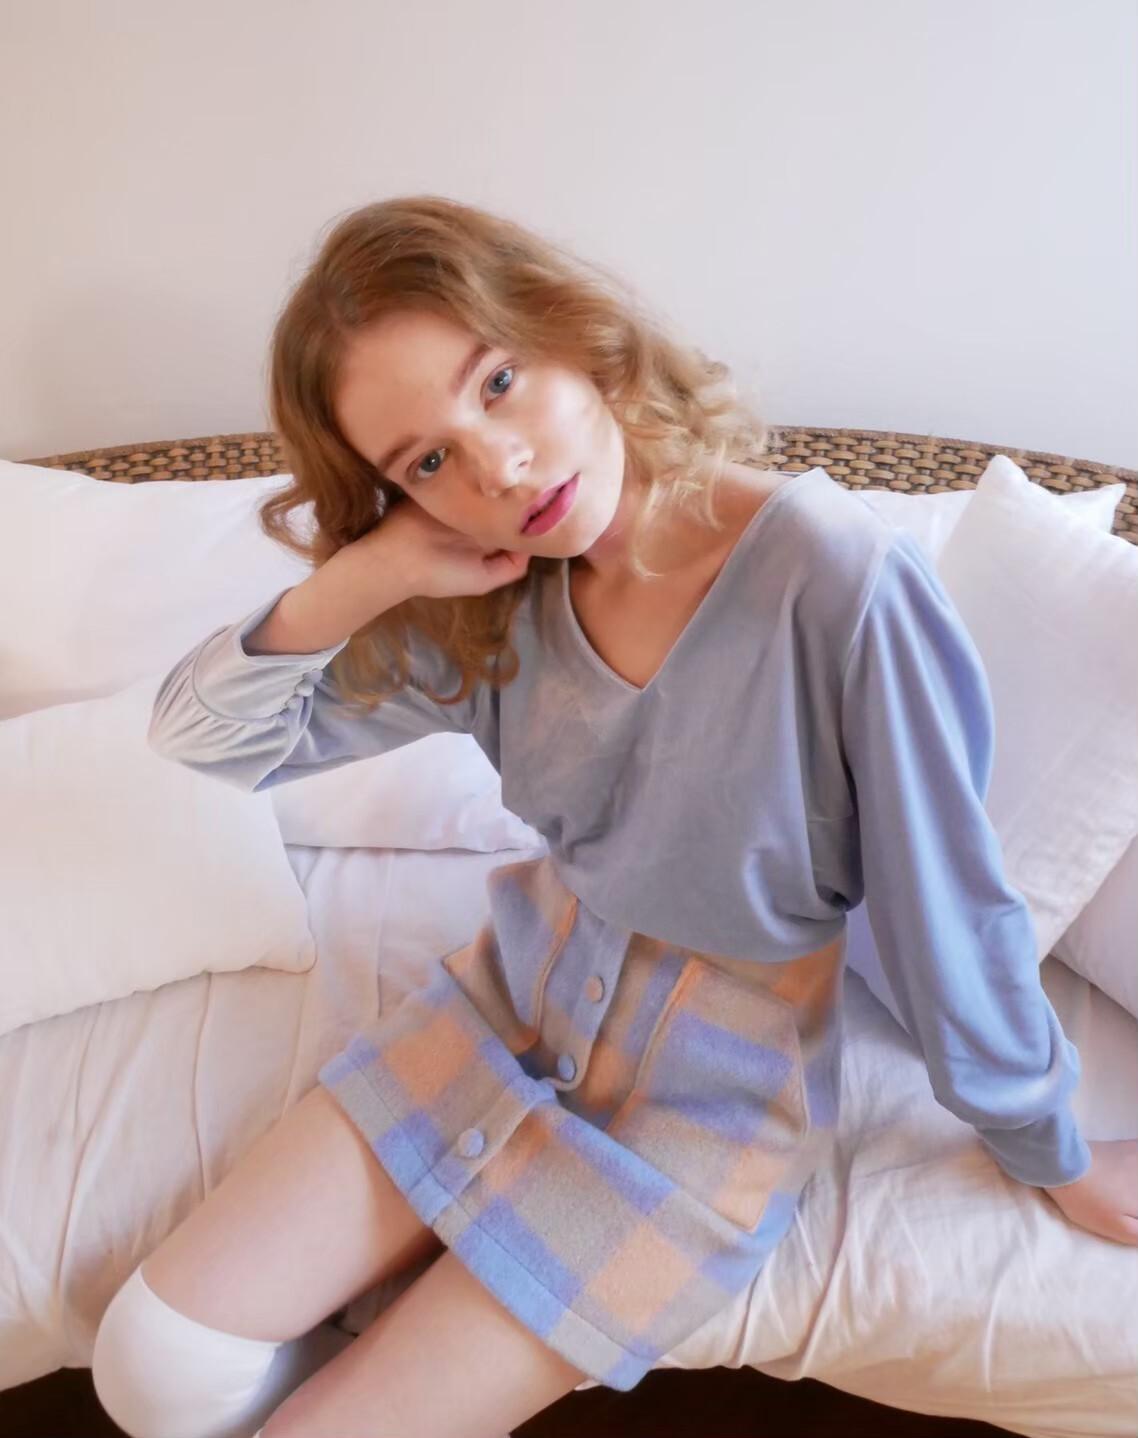 【KissMeLove】Front button tight skirt